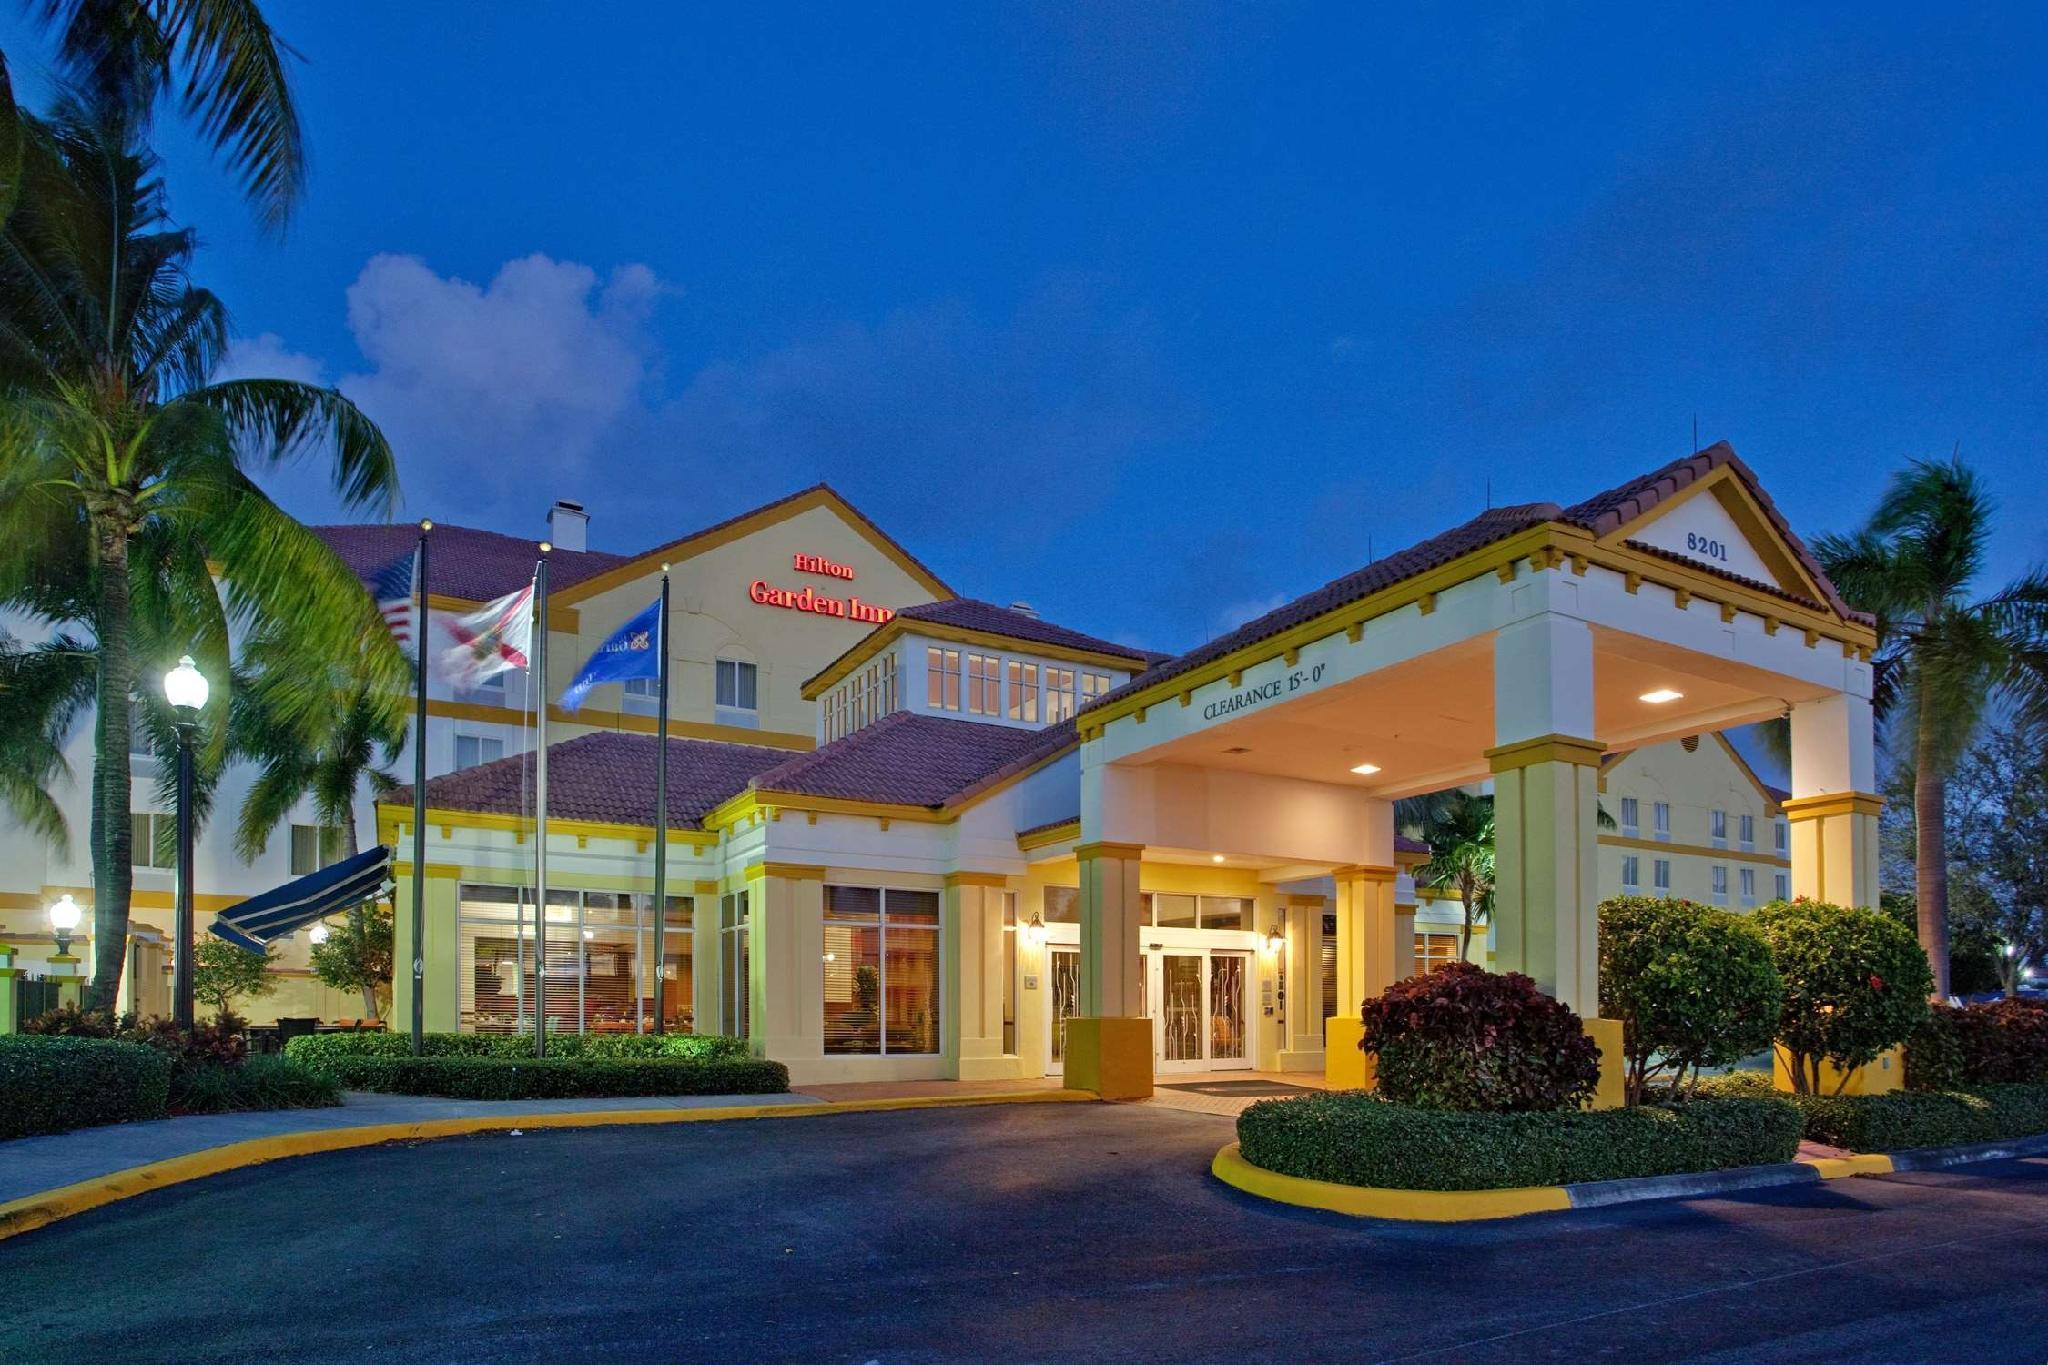 Hilton Garden Inn Boca Raton Hotel image